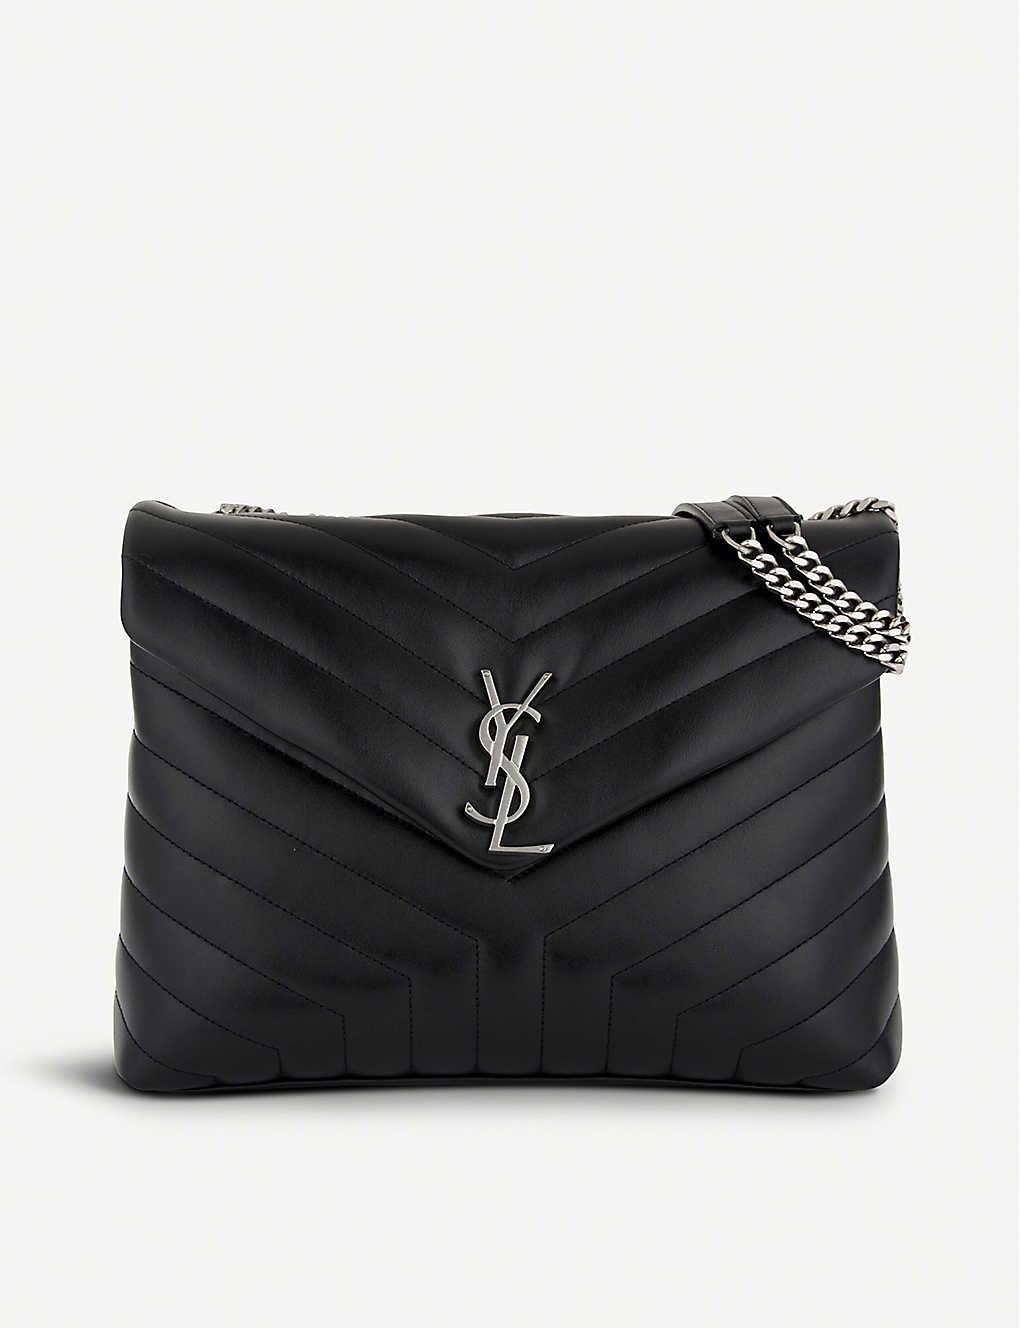 dbd648455 SAINT LAURENT - Loulou Monogram medium quilted leather shoulder bag ...